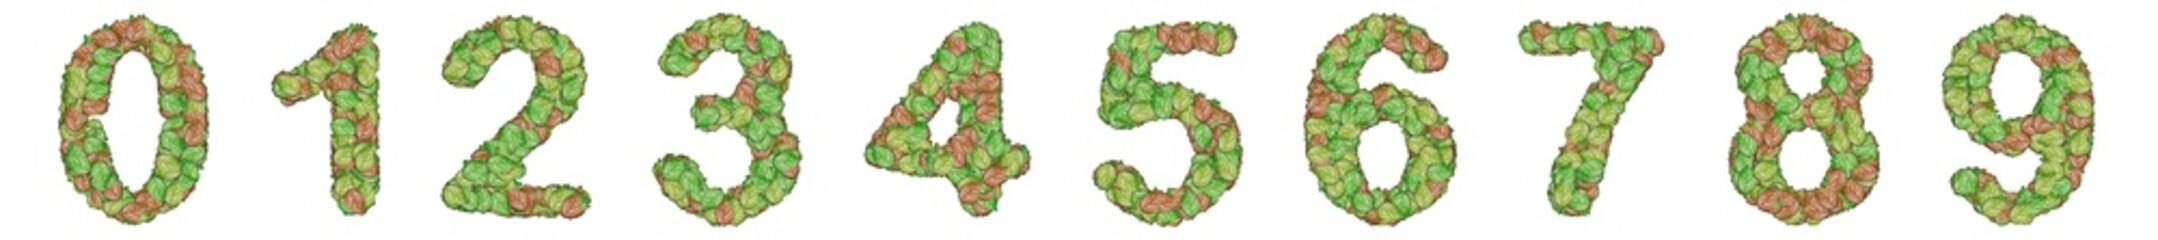 number alphabet leaf on white background